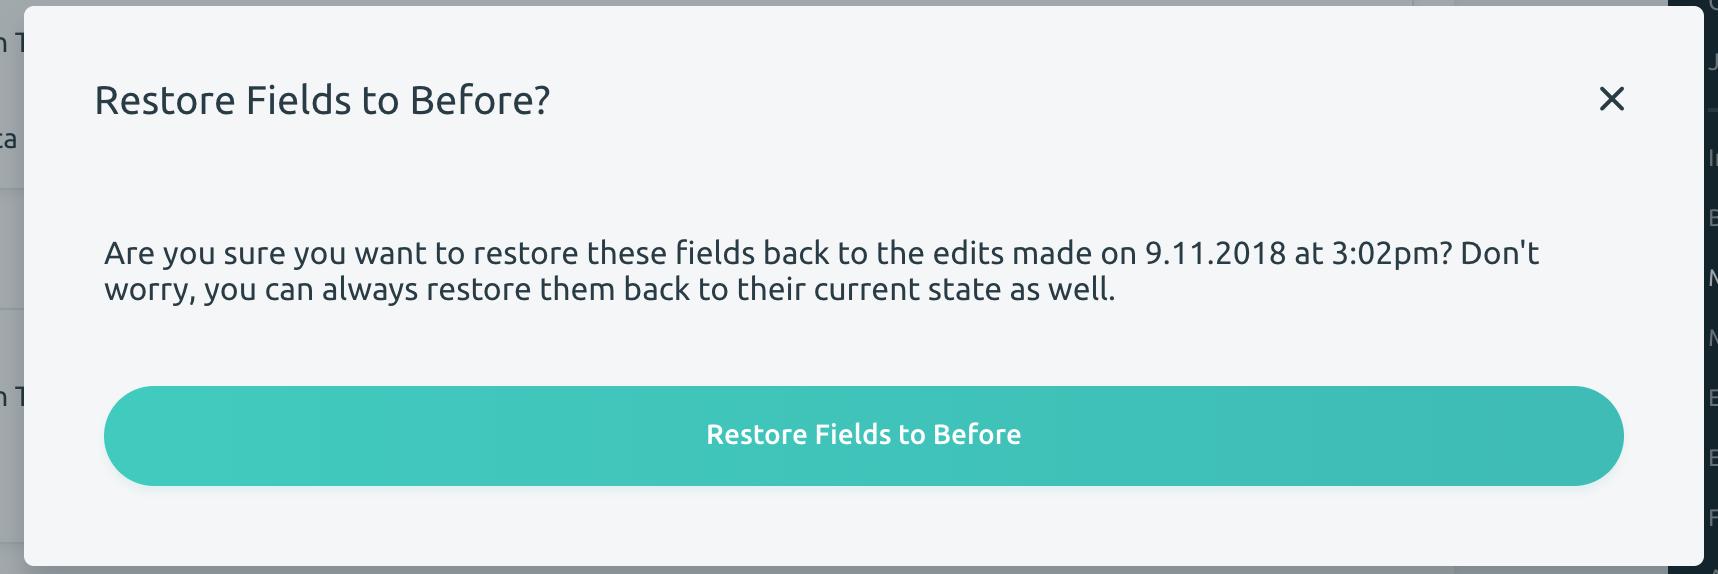 Restore Fields to Before Modal Update · Issue #290 · matrix-msu